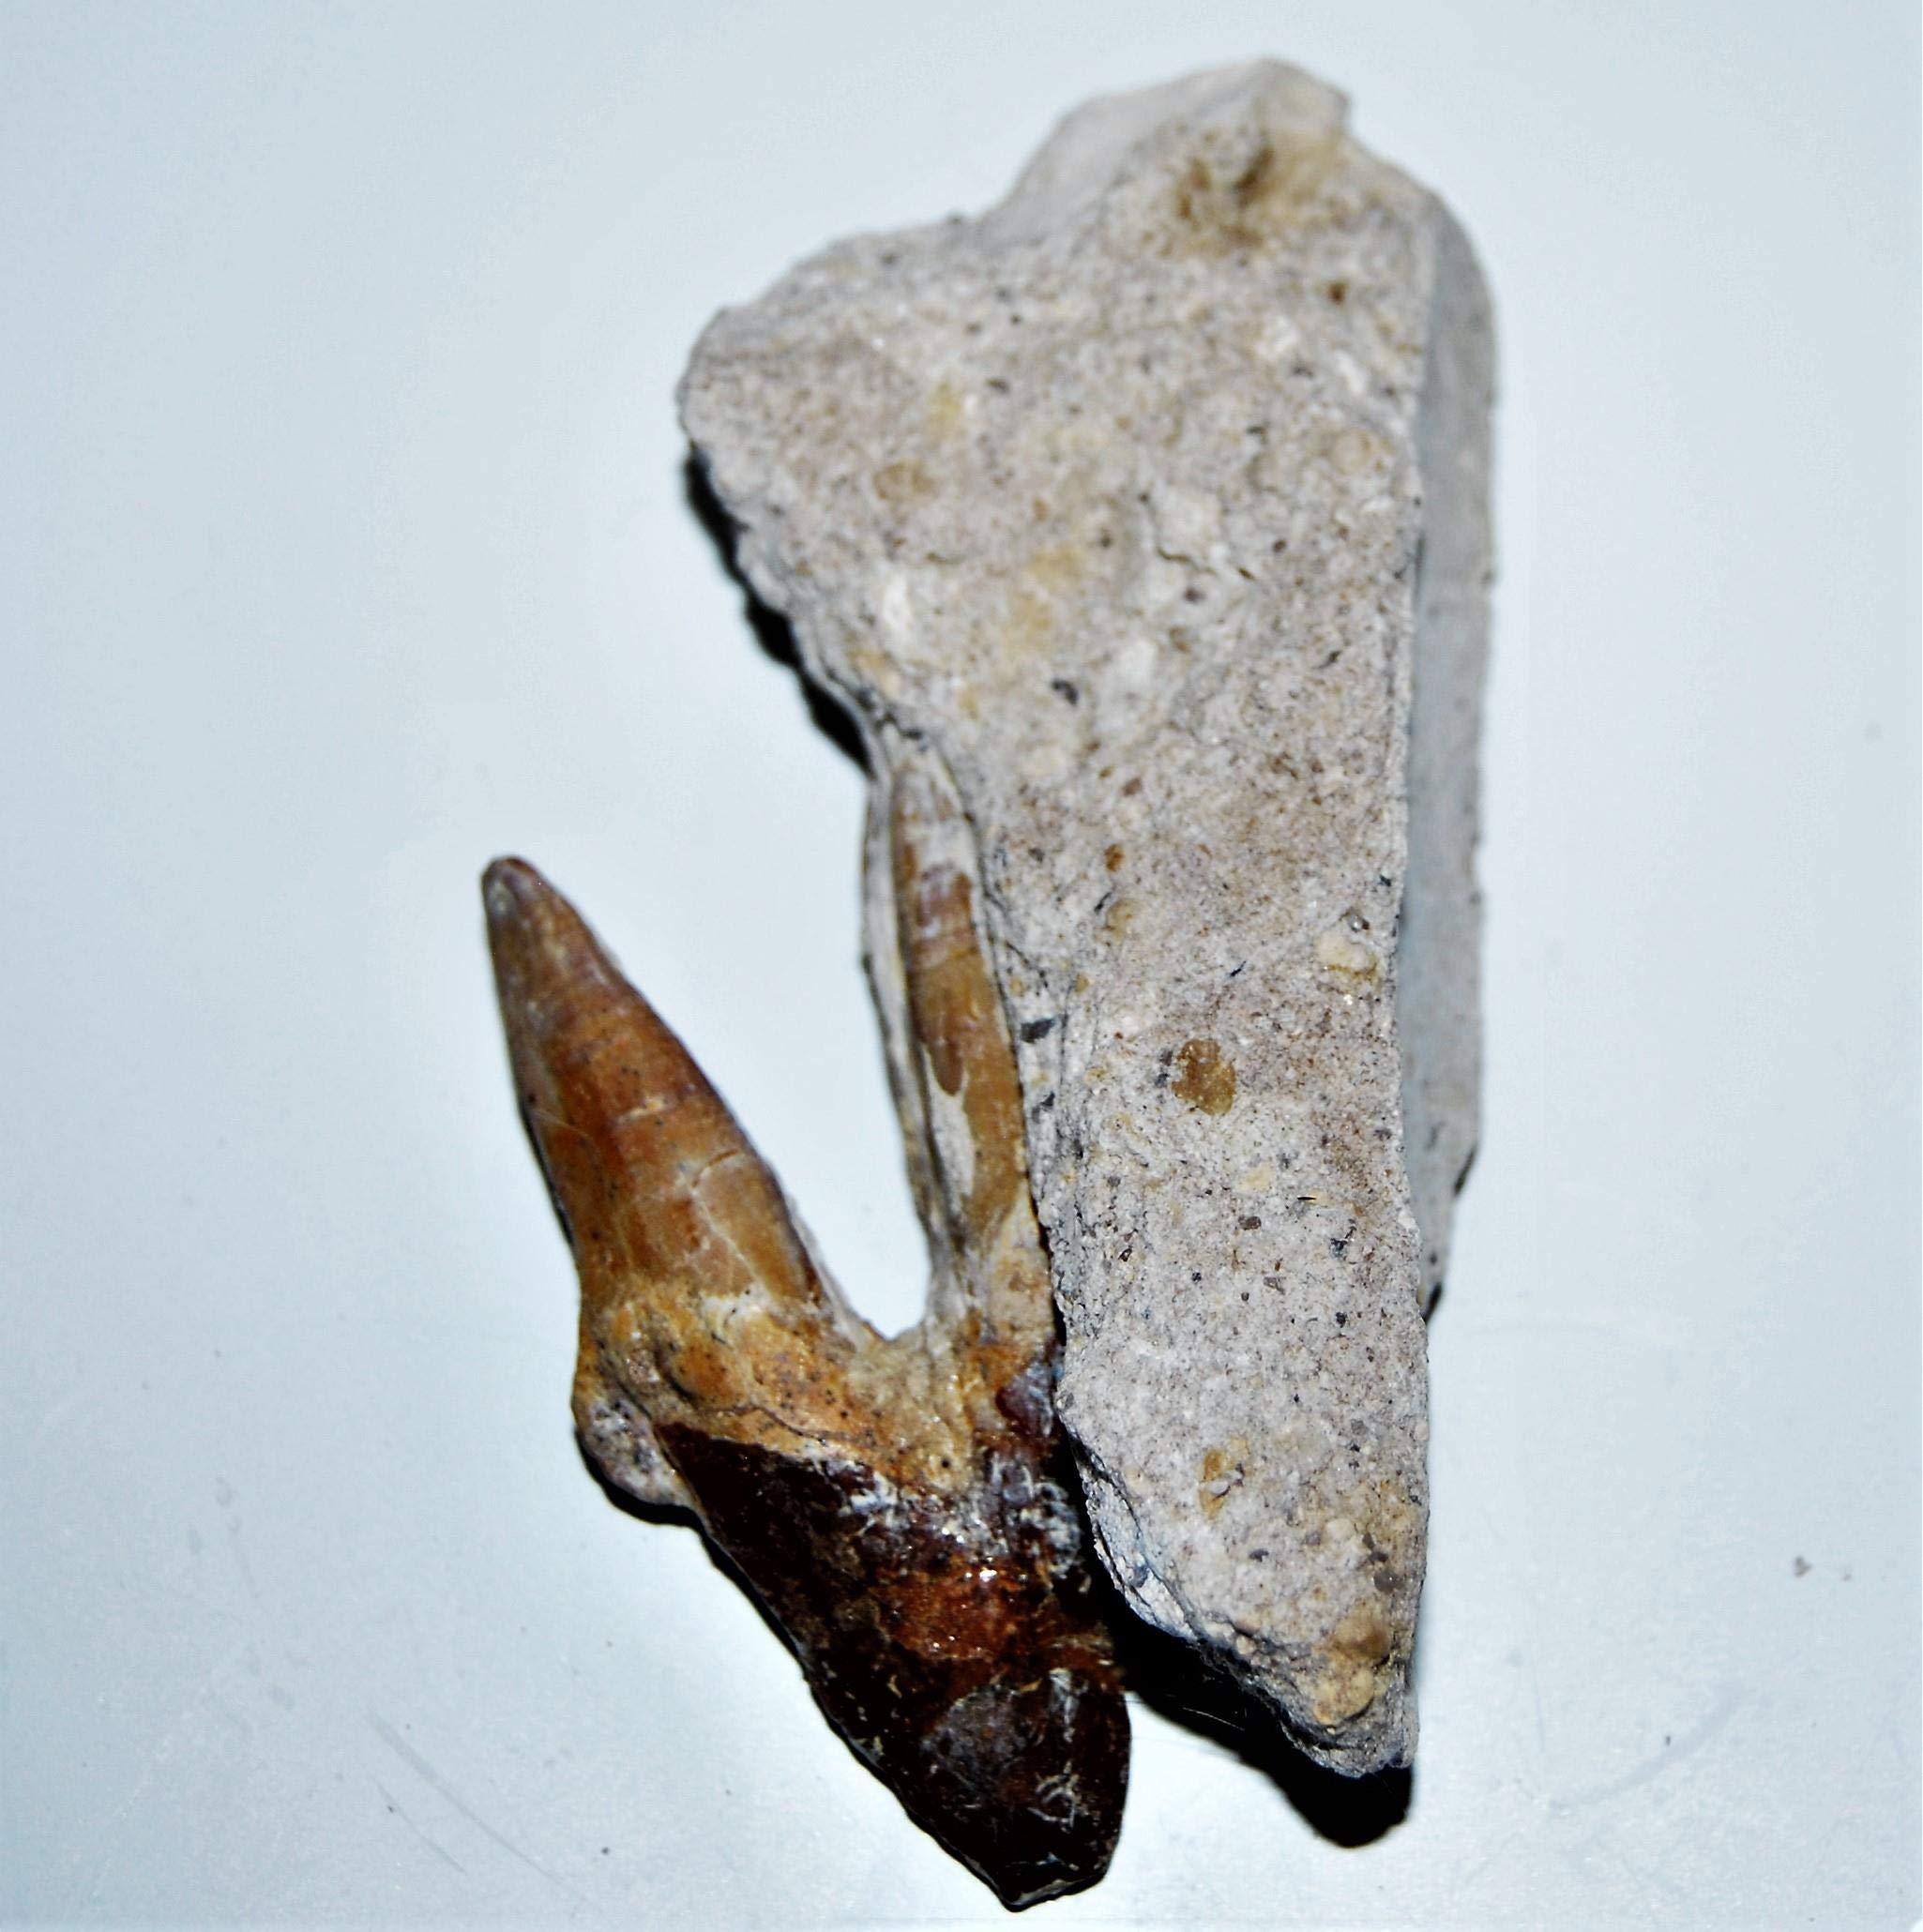 BASILOSAURUS Tooth Fossil Late Eocene 40 Million Years Old #14333 7o